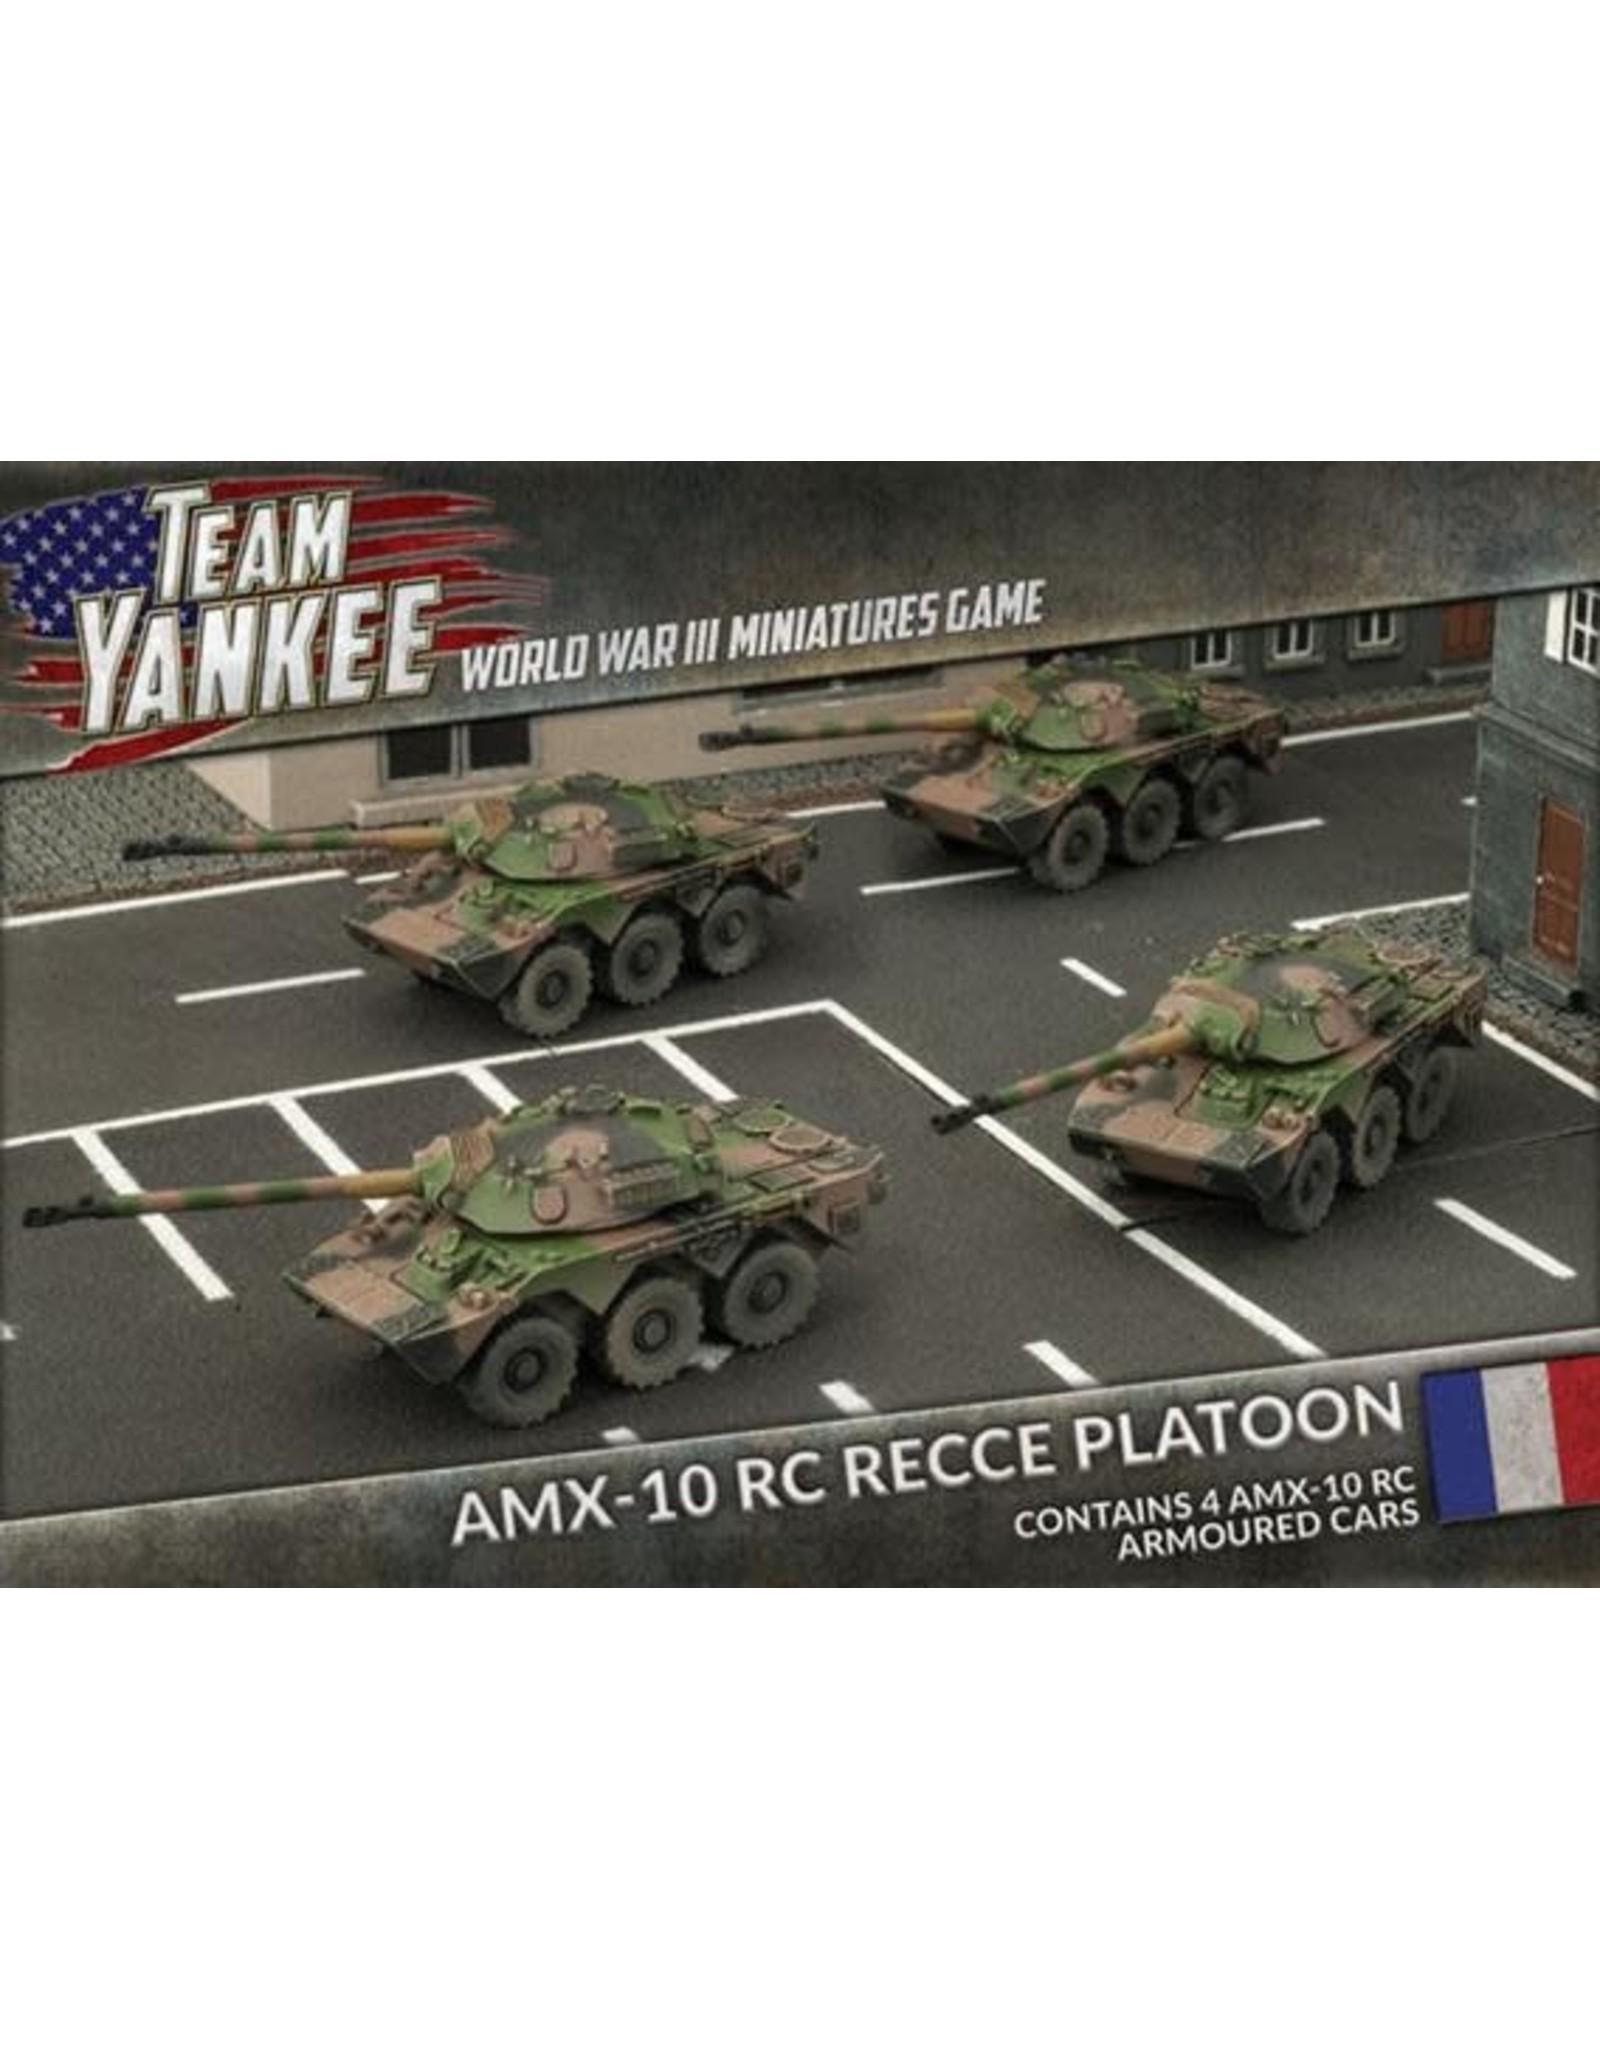 Team Yankee Team Yankee: AMX-10 RC Recce Platoon